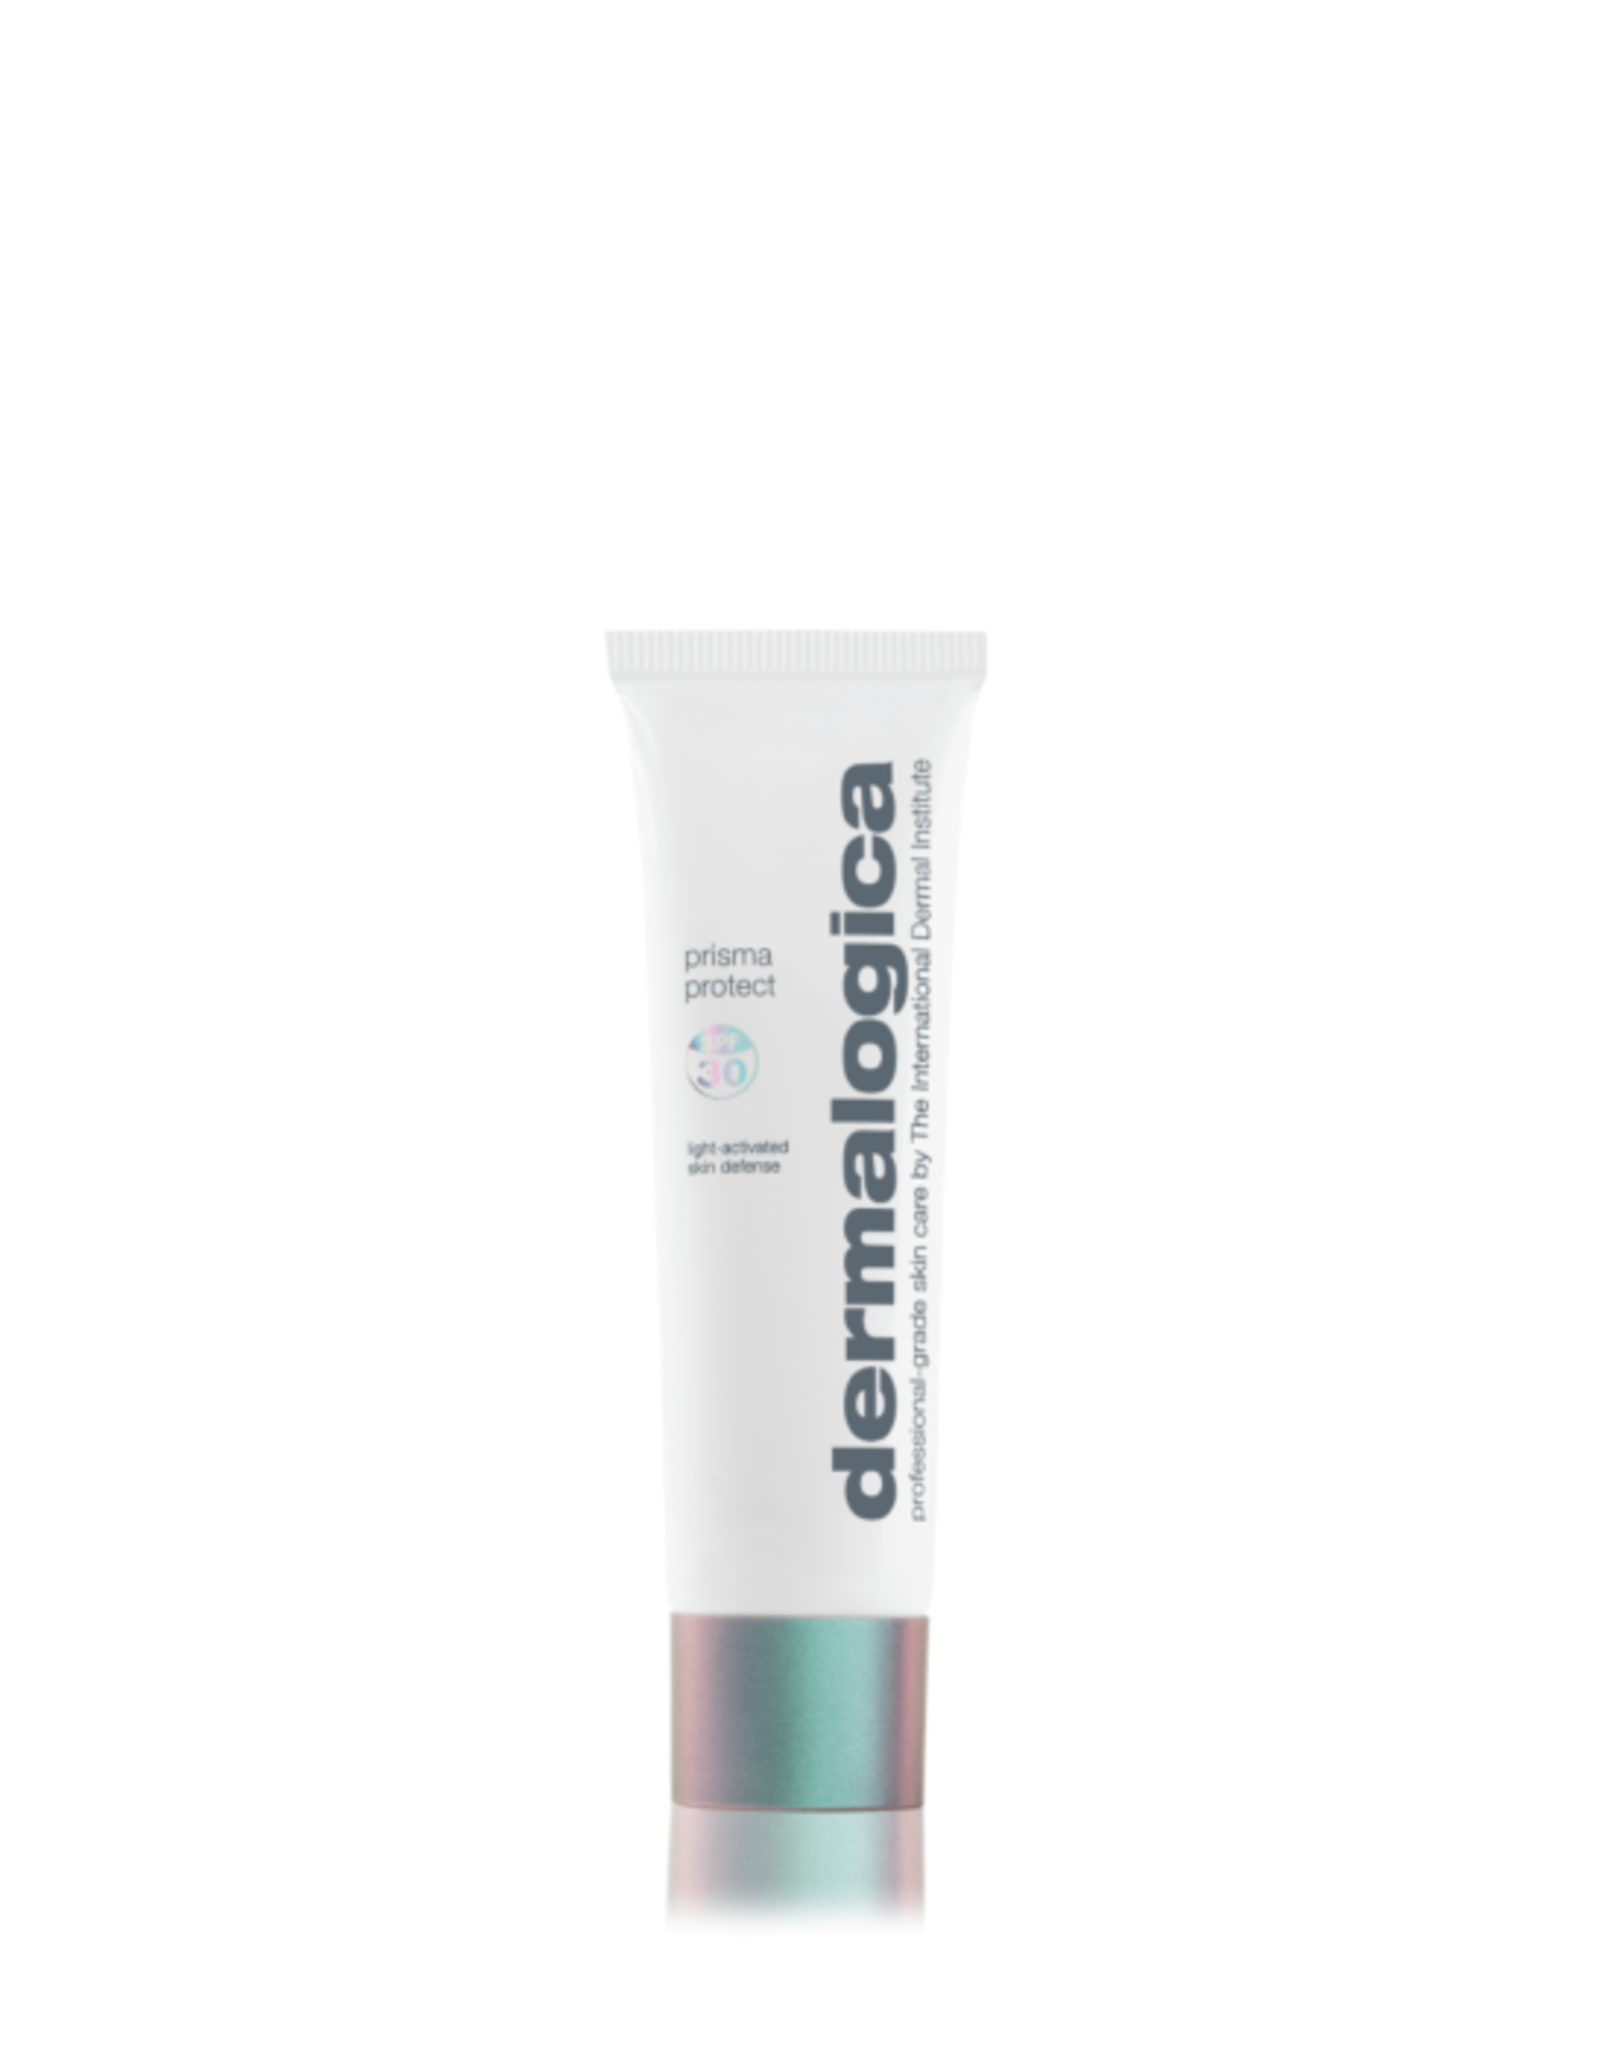 Dermalogica Prisma Protect 50ml - Dermalogica